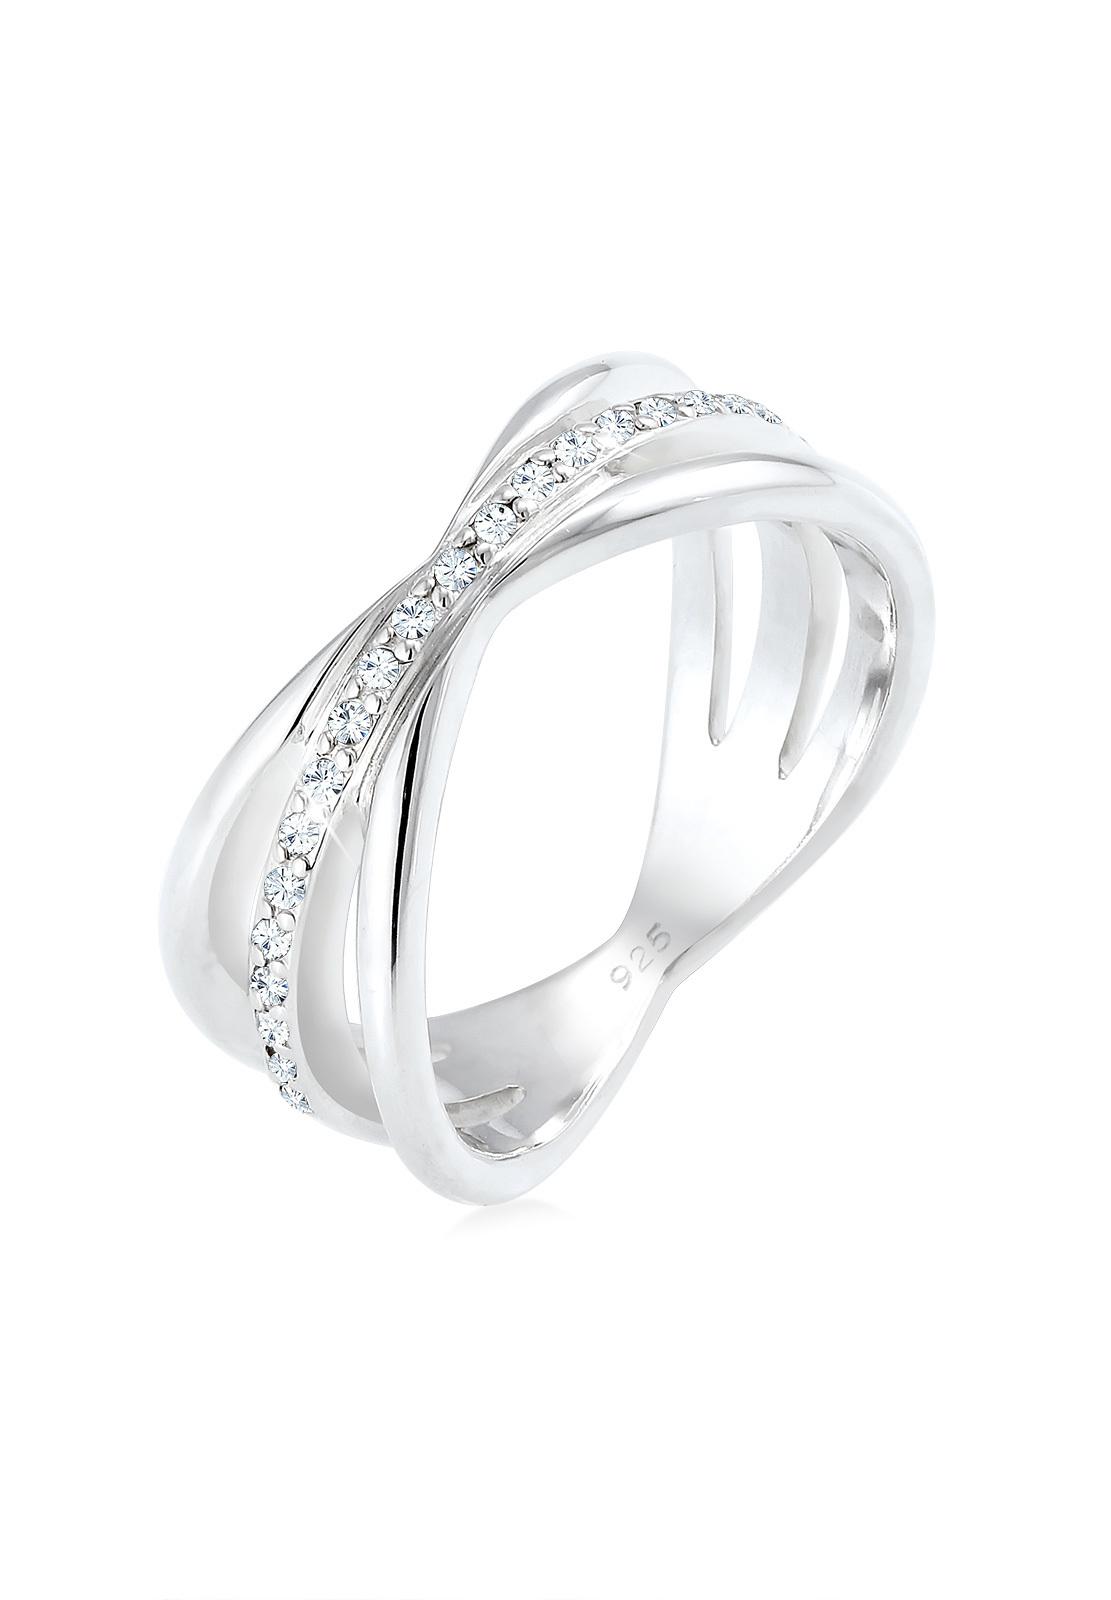 Wickelring   Kristall ( Weiß )   925er Sterling Silber